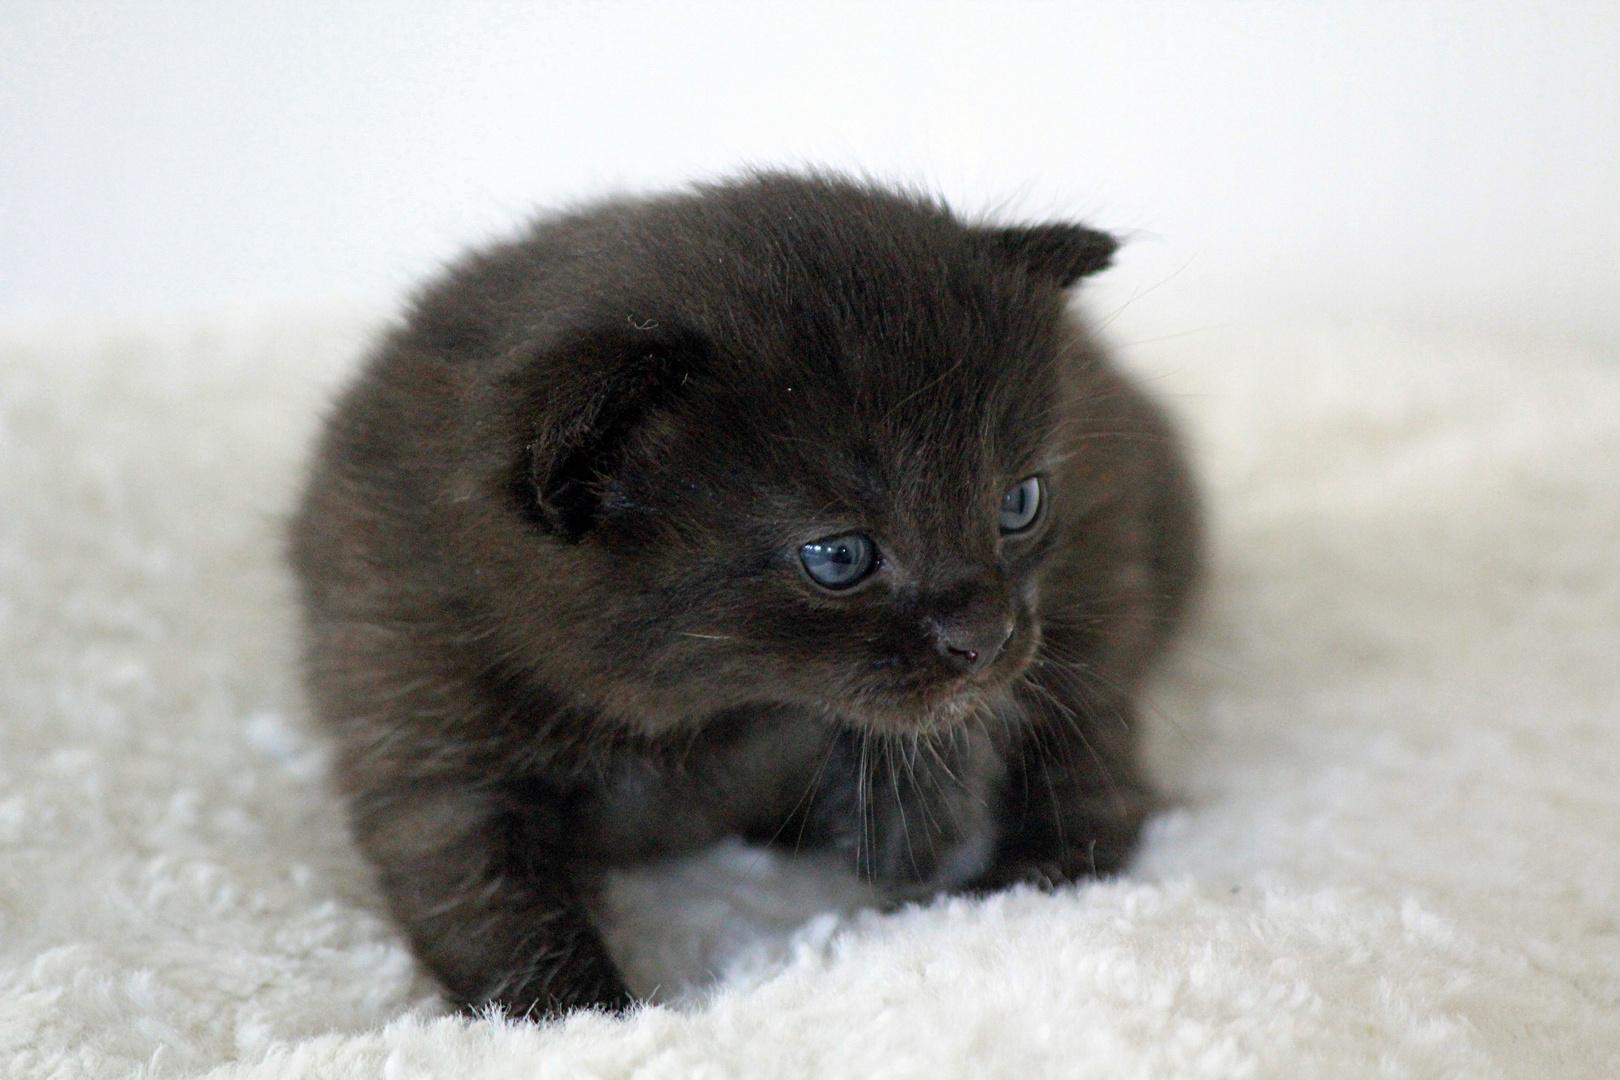 The little grey Kitten